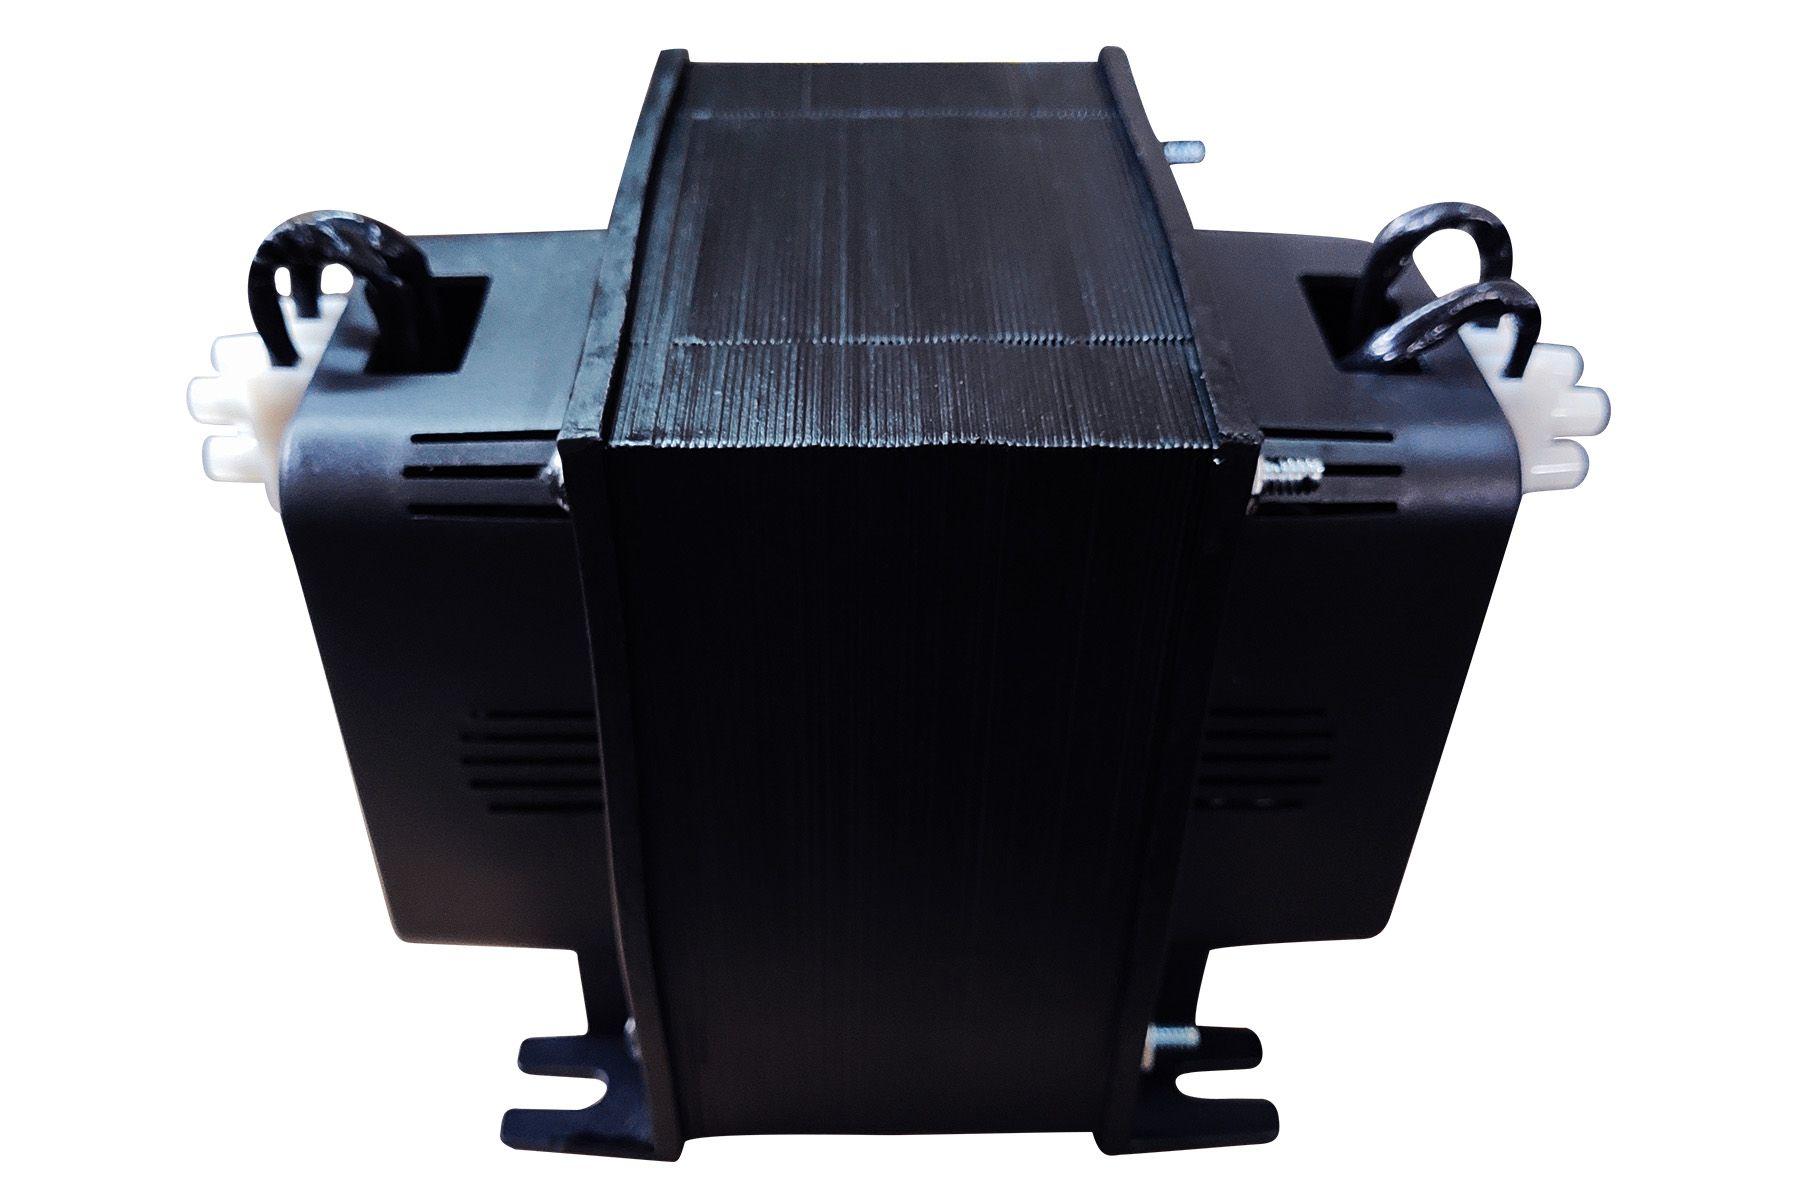 Autotransformador 4000 VA Profissional 127 / 220 V e 220 / 127 V GIRARDI